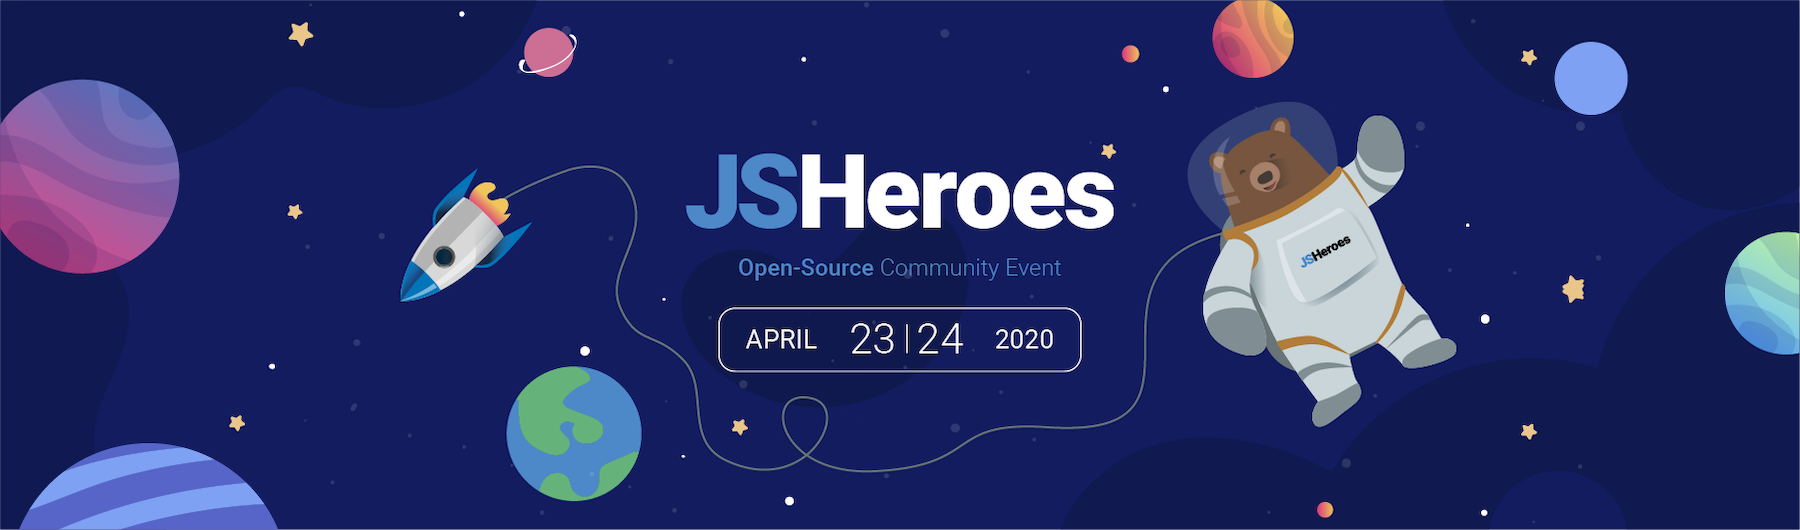 JSHeroes 2020